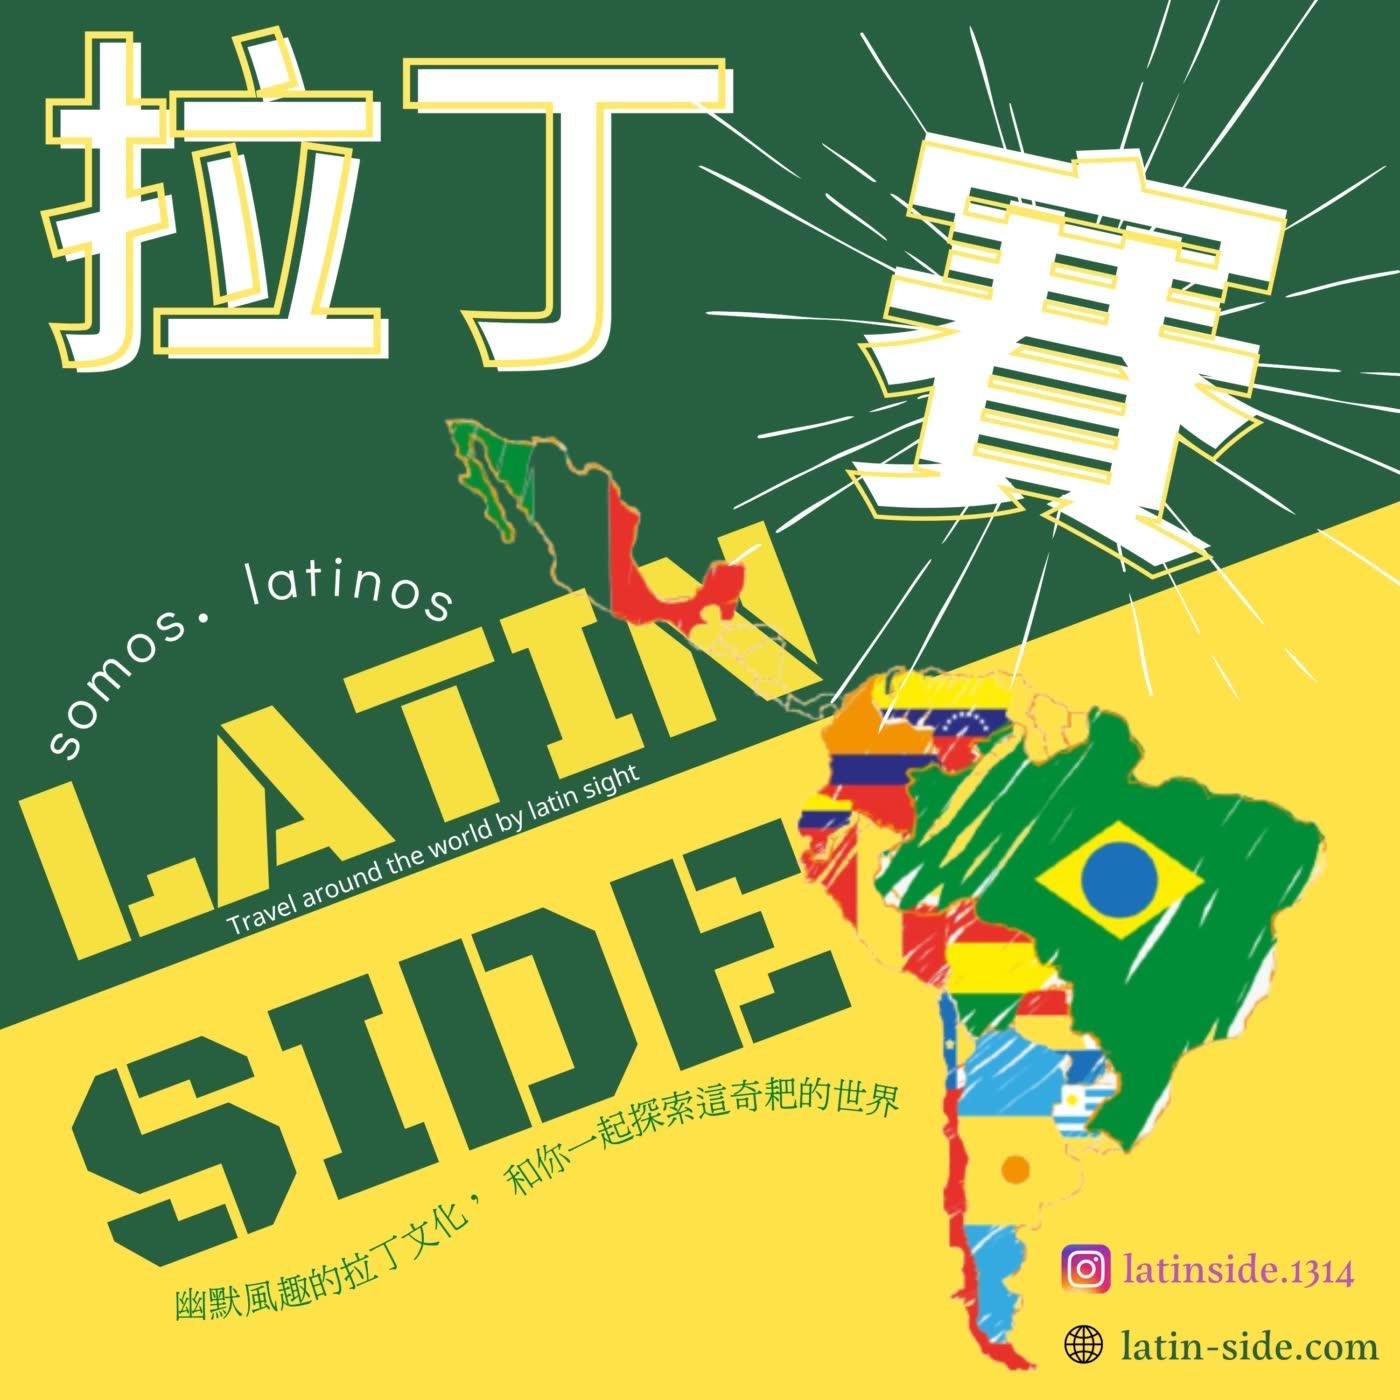 拉丁賽 LatinSide